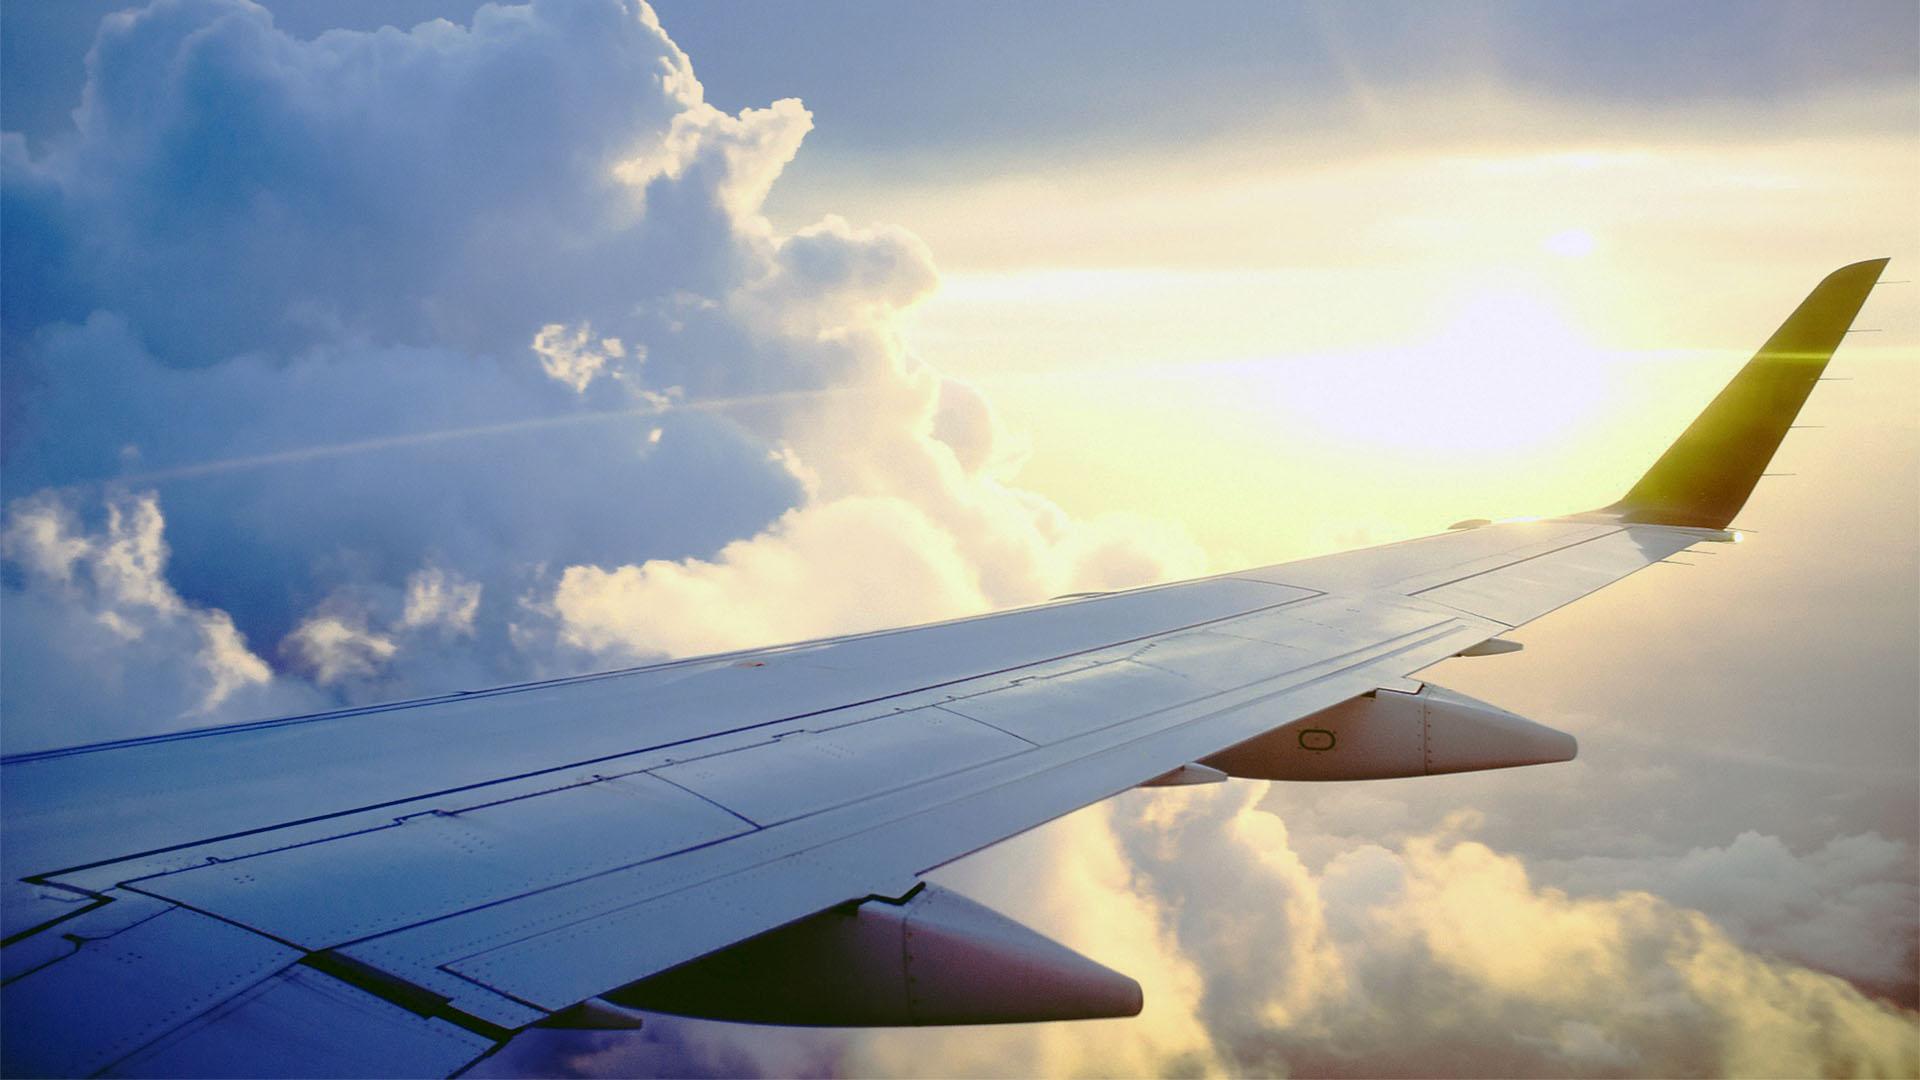 Slider transporte aéreo